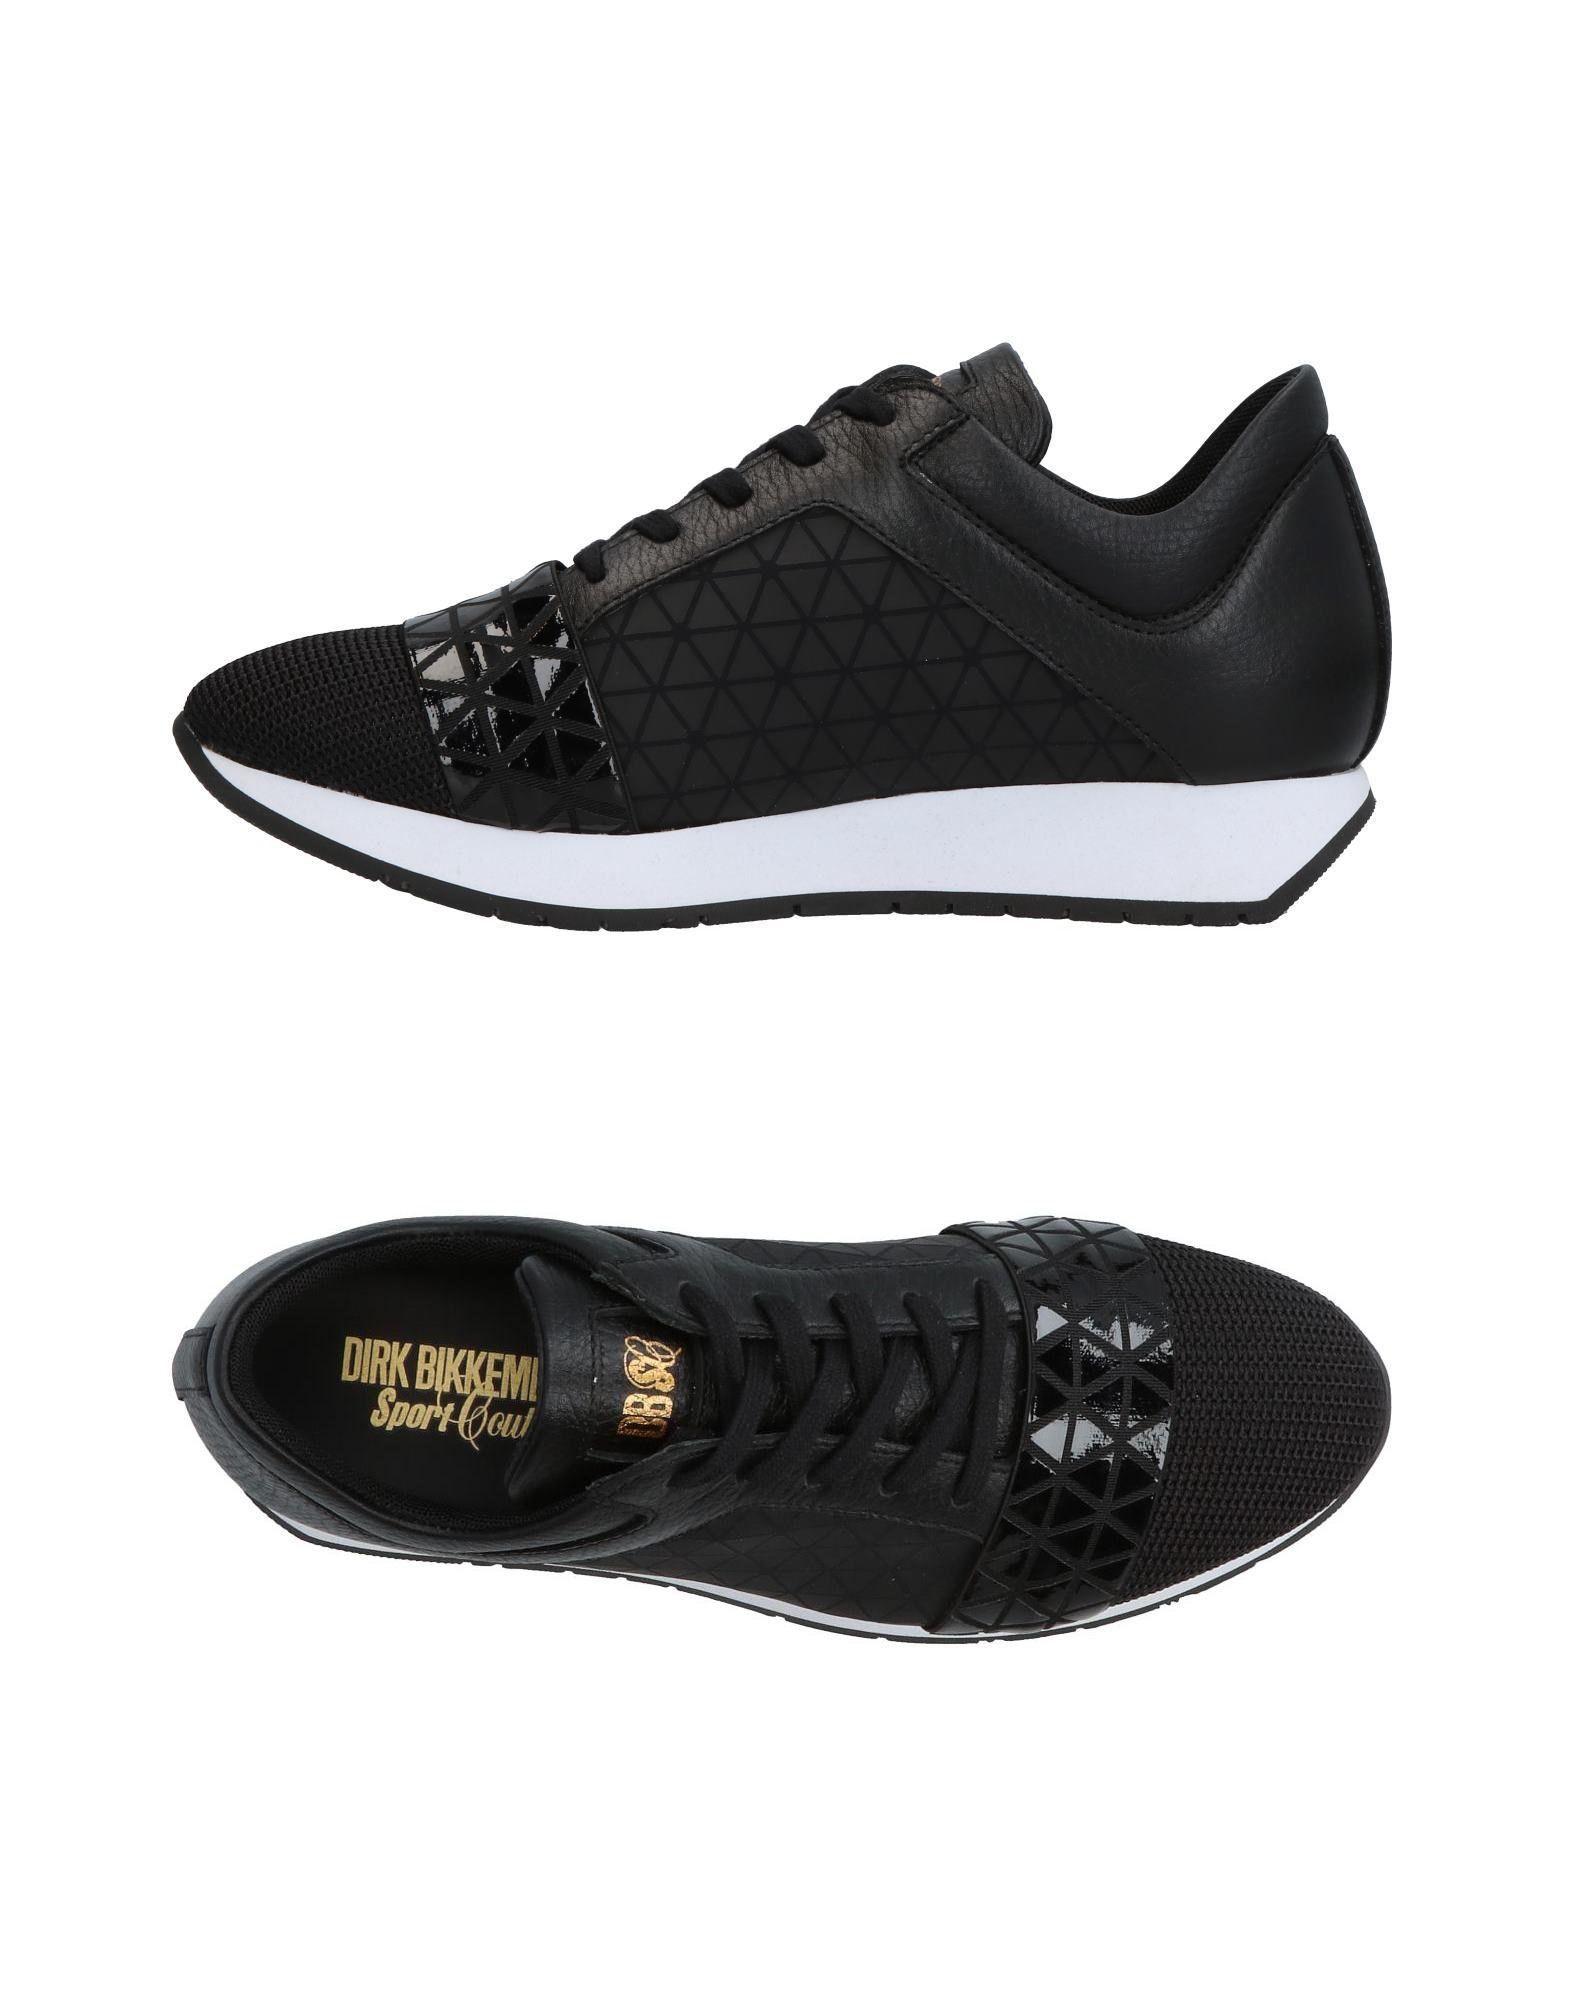 reputable site c2461 347e8 DIRK BIKKEMBERGS SNEAKERS. #dirkbikkembergs #shoes # | Dirk ...